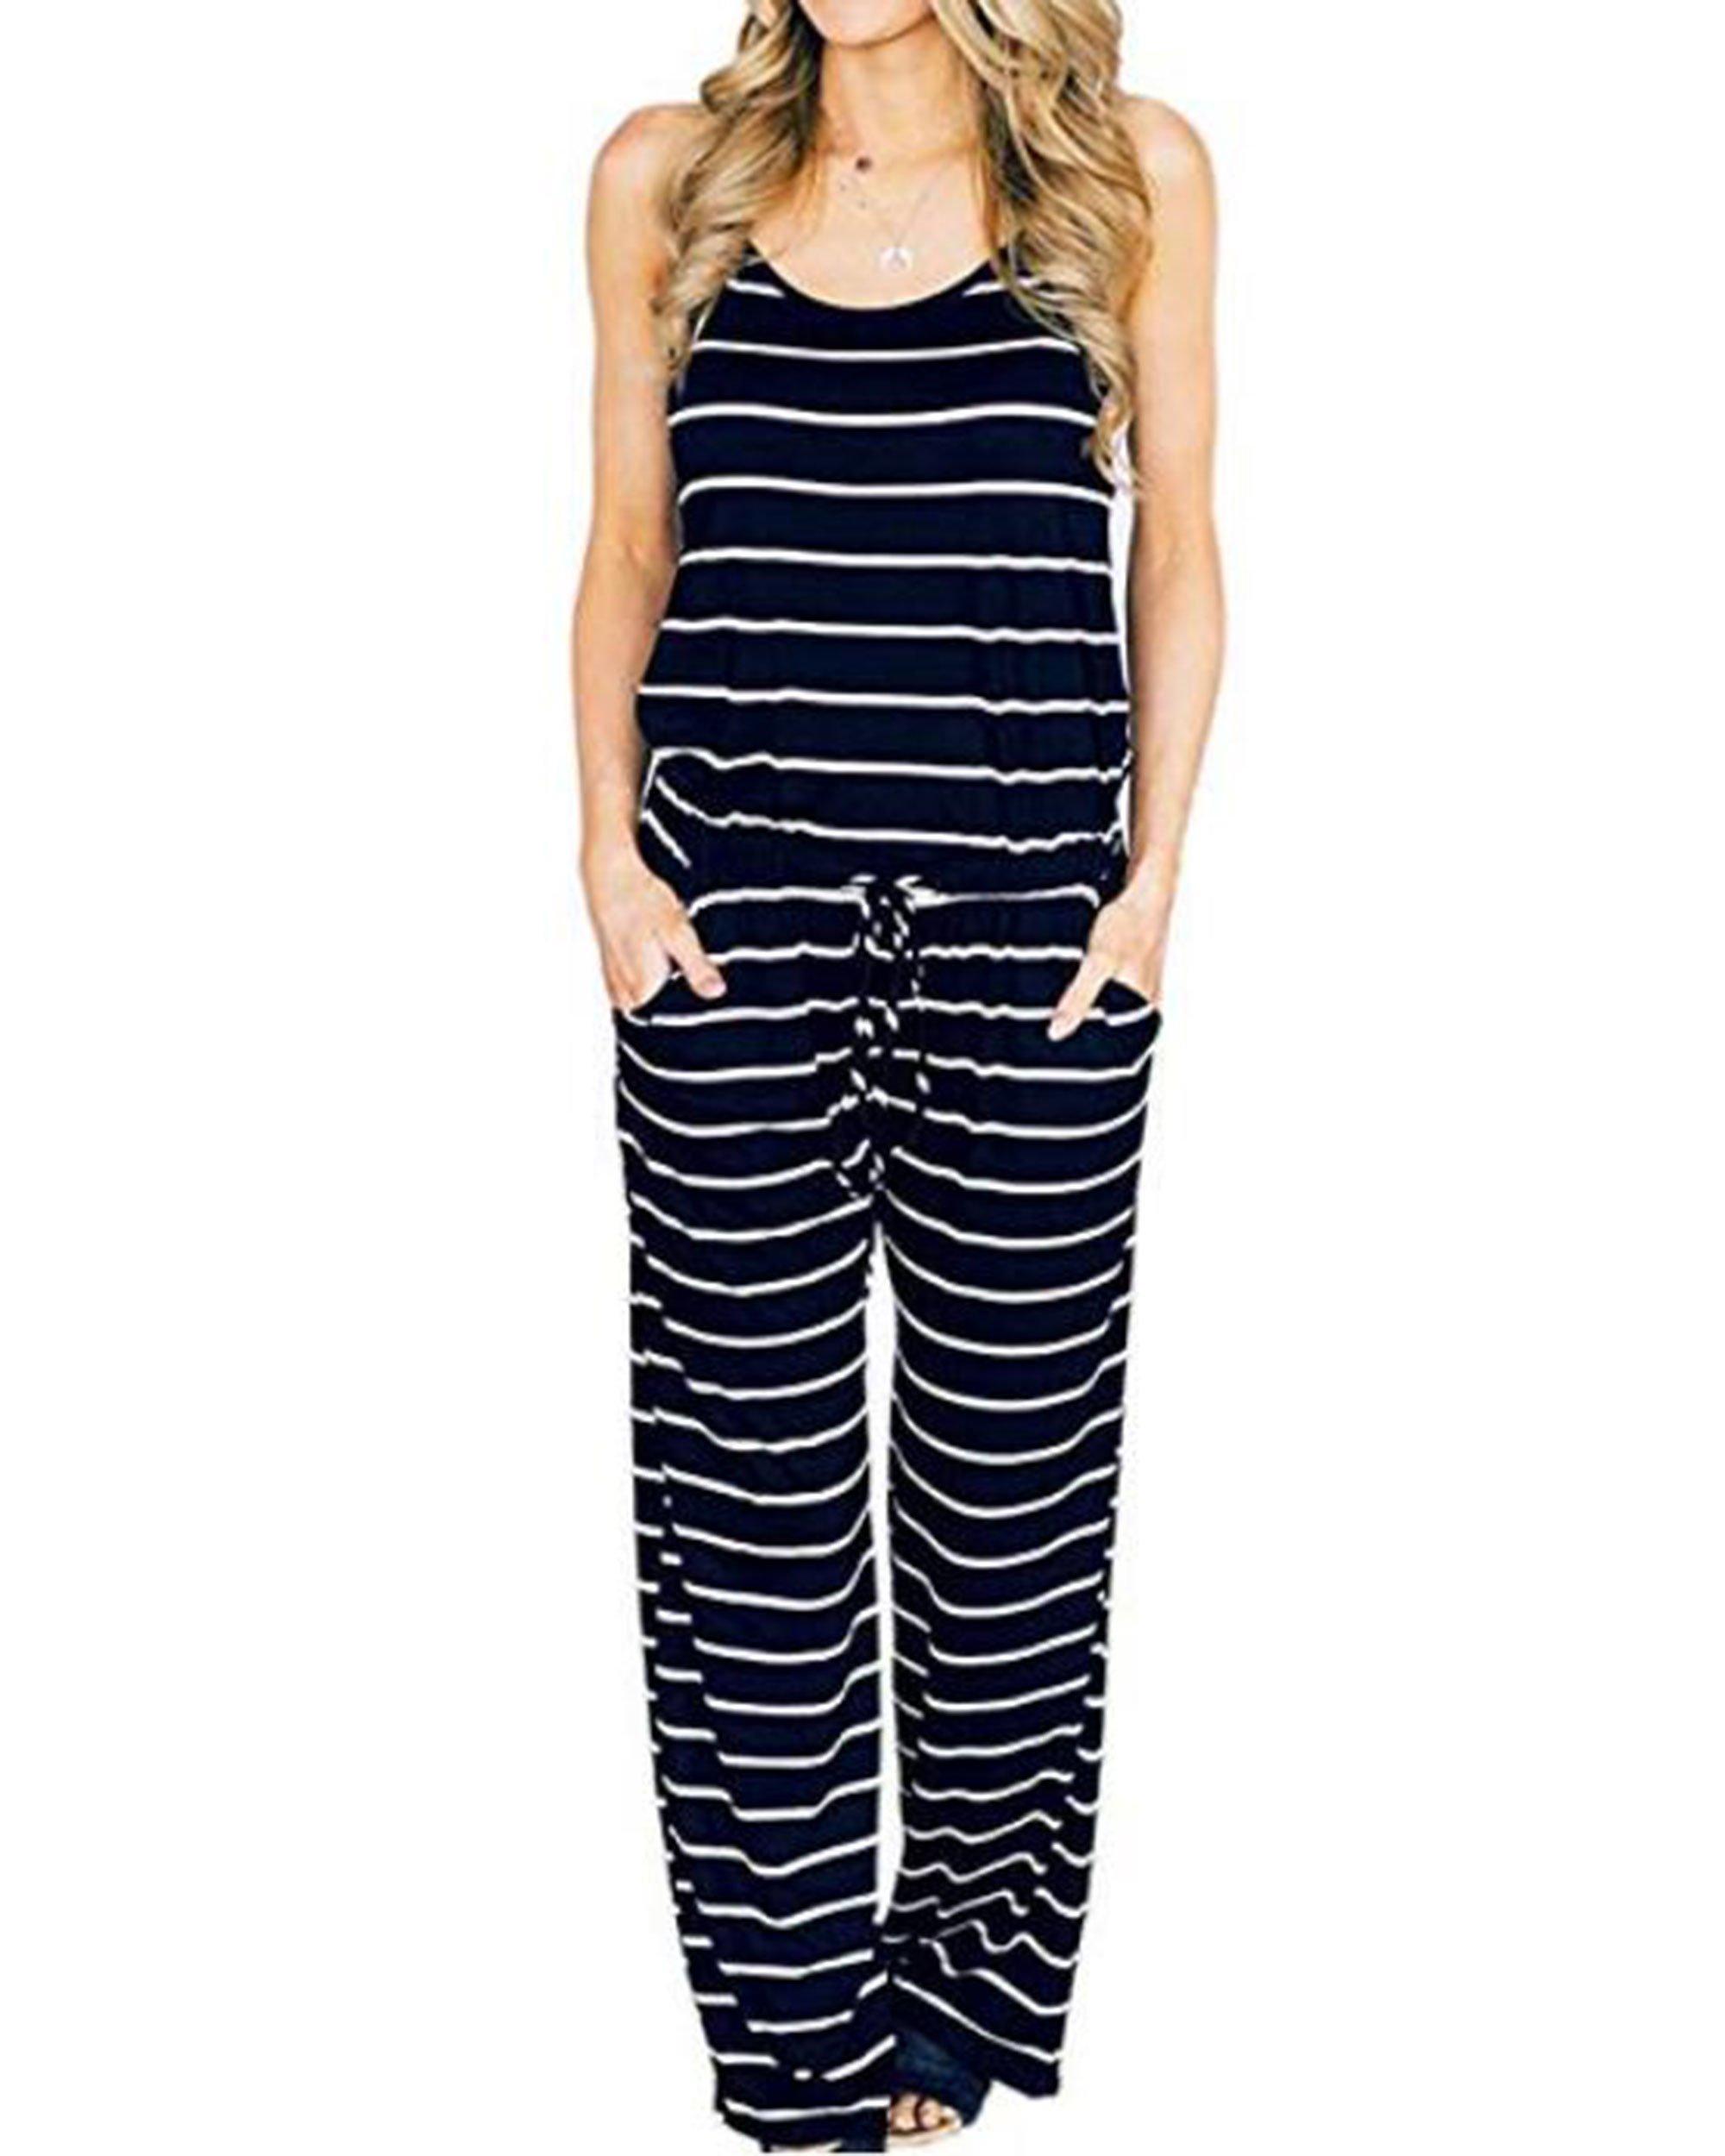 LUBERLIN Womens Flora Print Jumpsuits Halter Sleeveless Wide Long Pants Jumpsuit Rompers (Navy Blue, M)